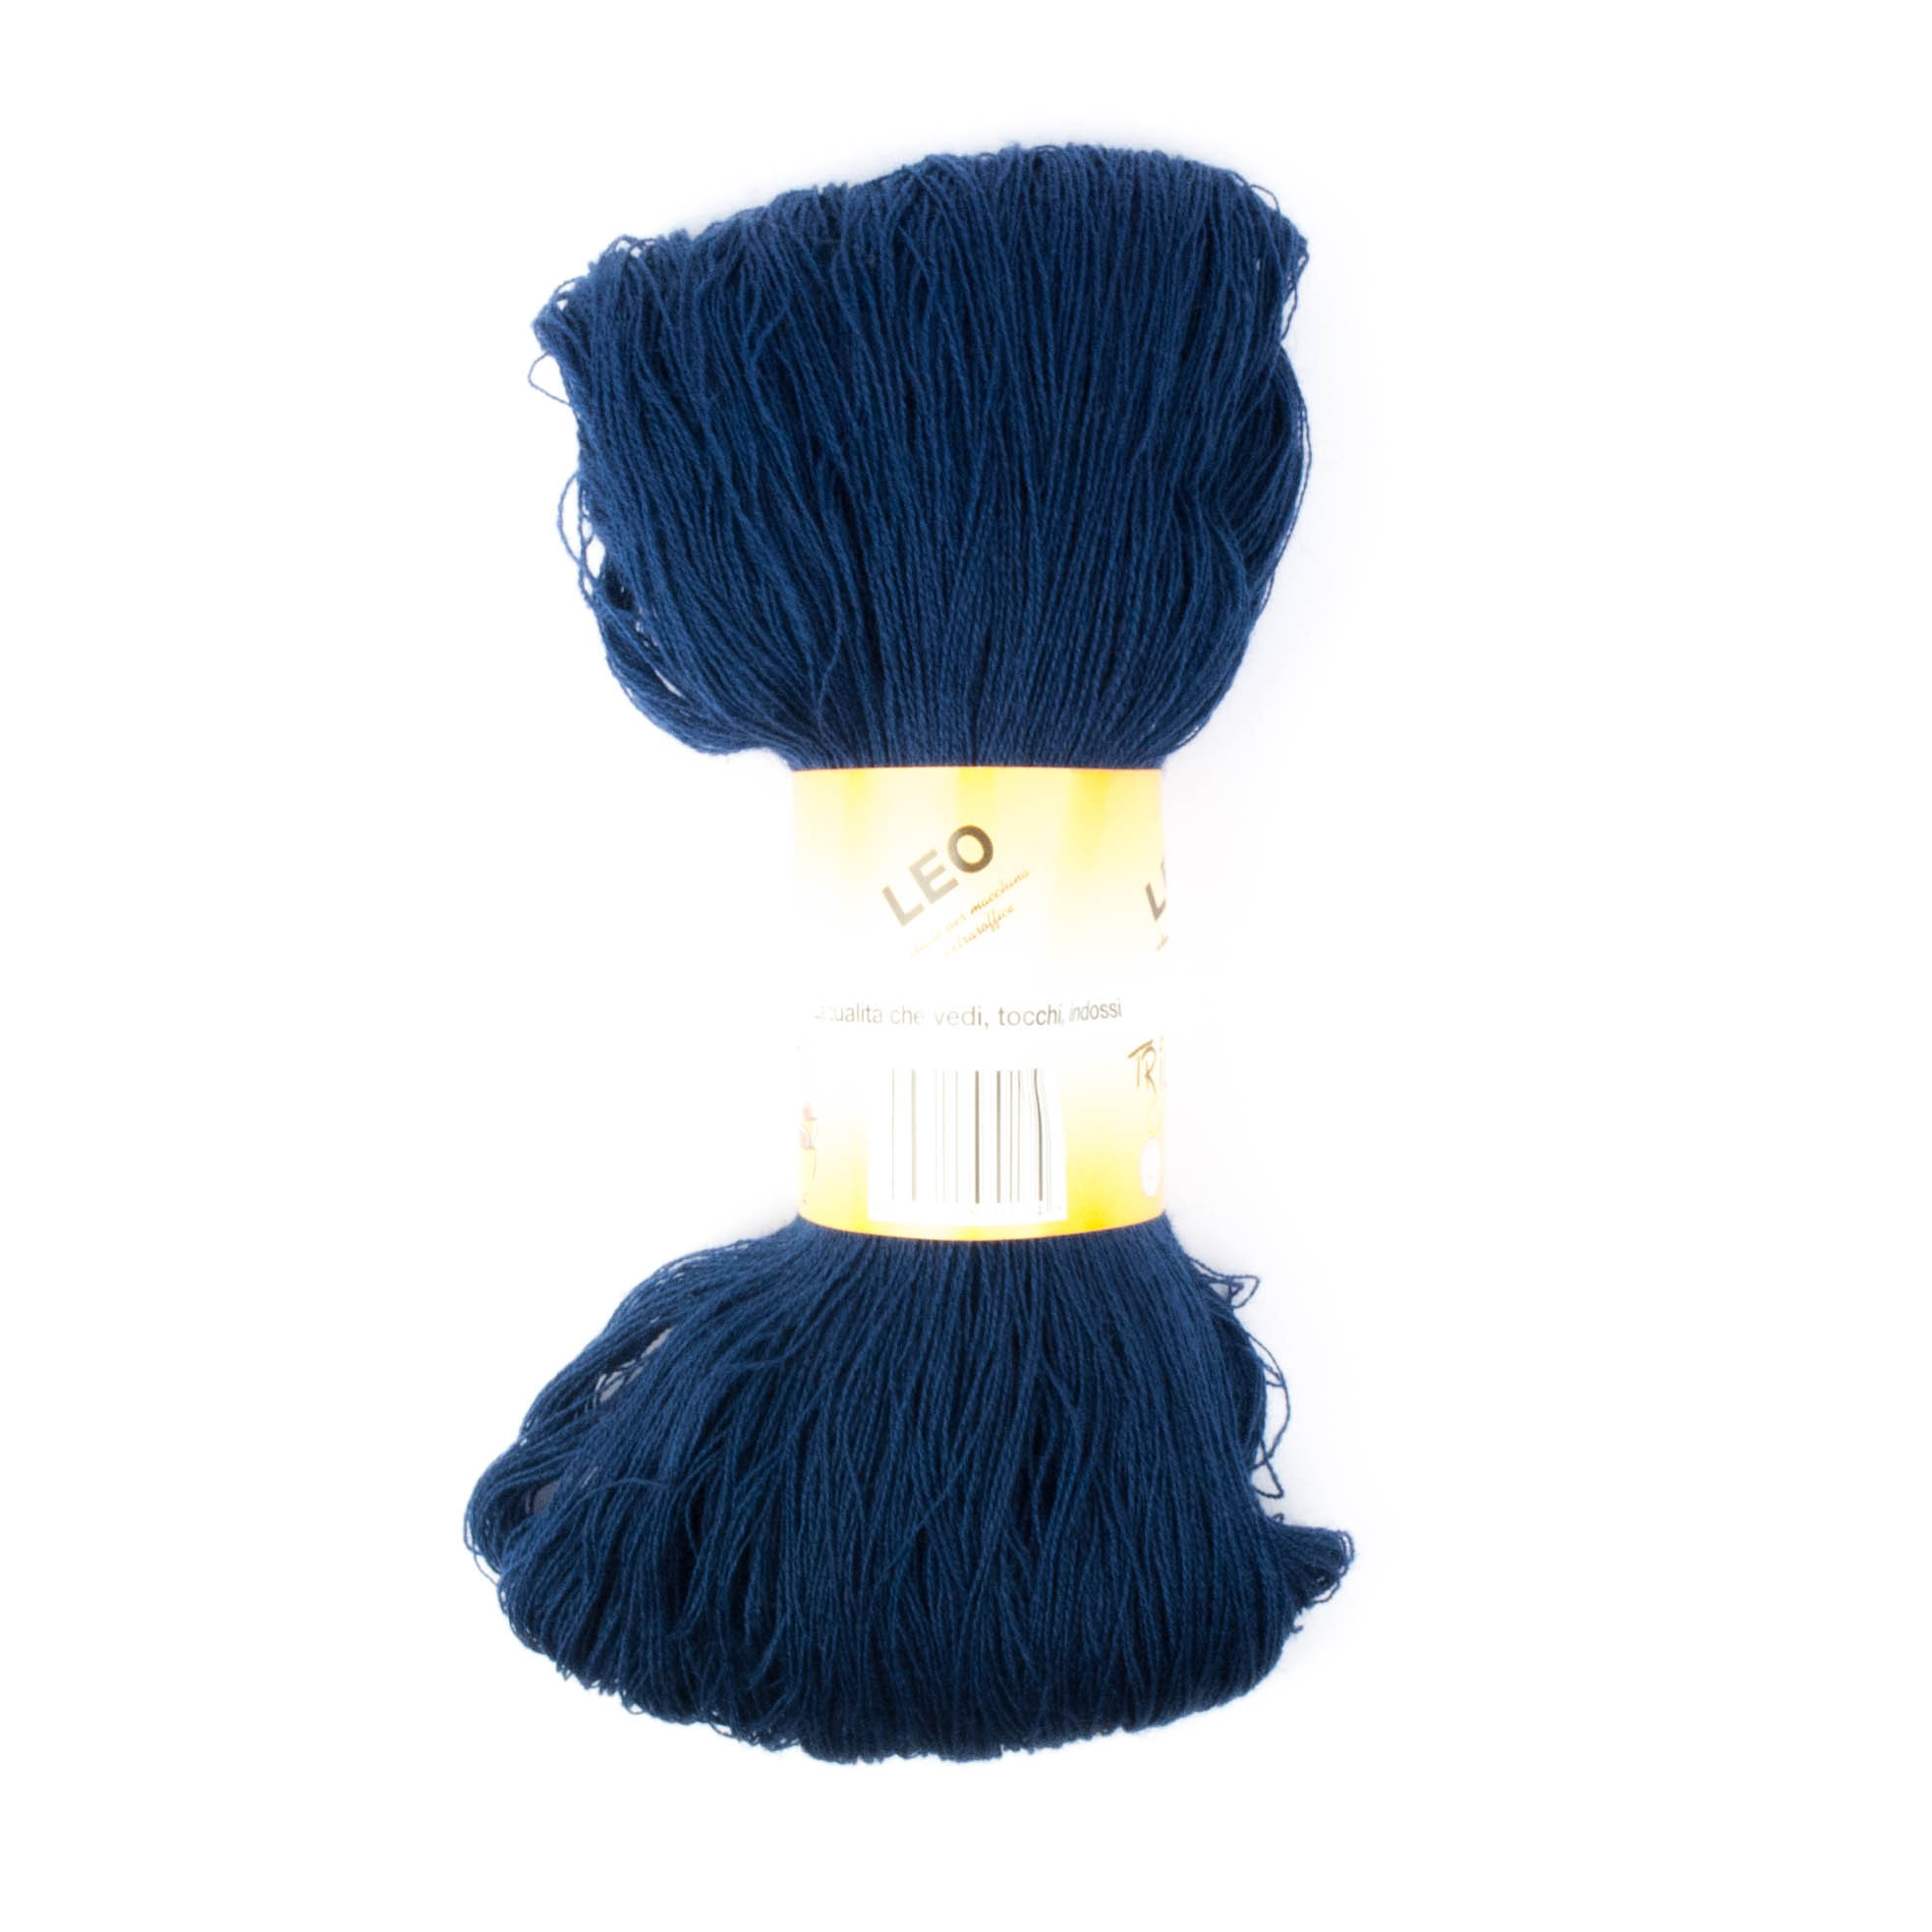 Leo - Matassa misto lana ideale per lavori a mano e macchina - Blu Notte 24